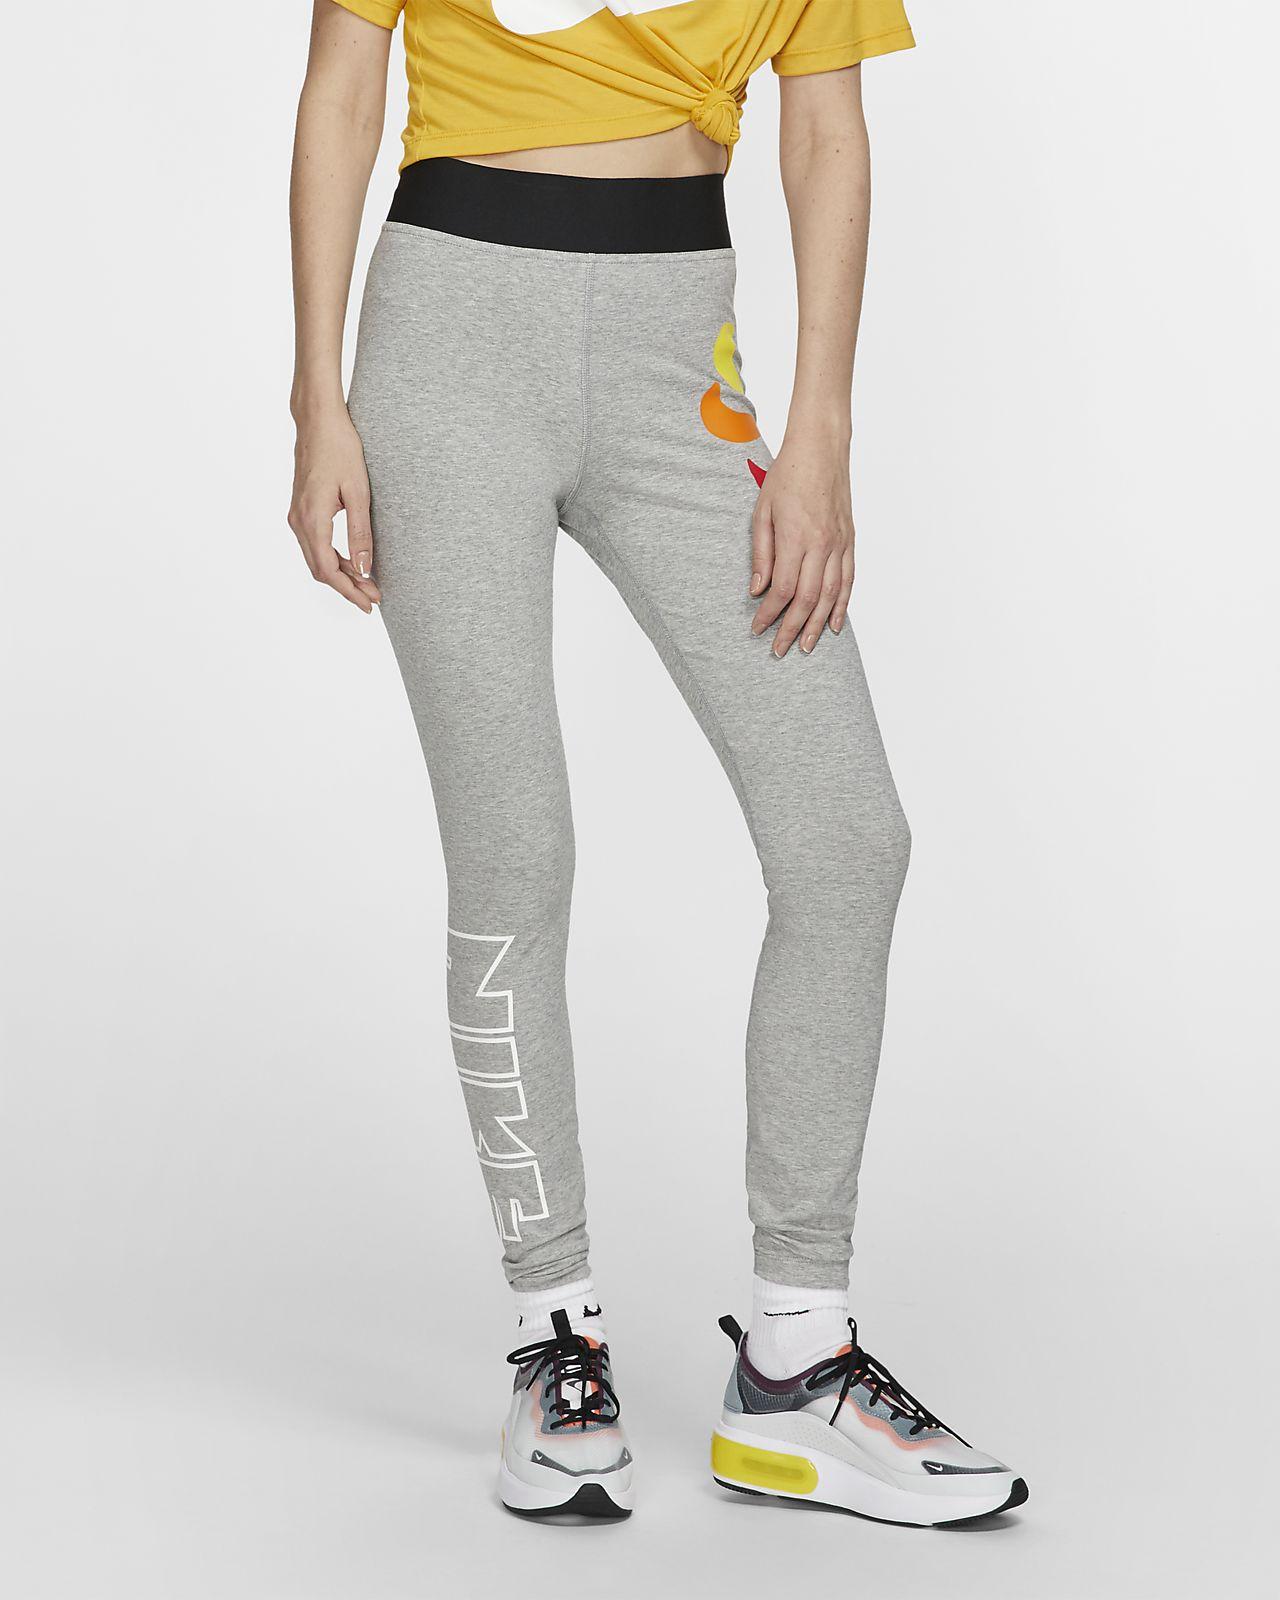 fdd6f8edc1 Nike Sportswear Leg-A-See Women's Leggings. Nike.com